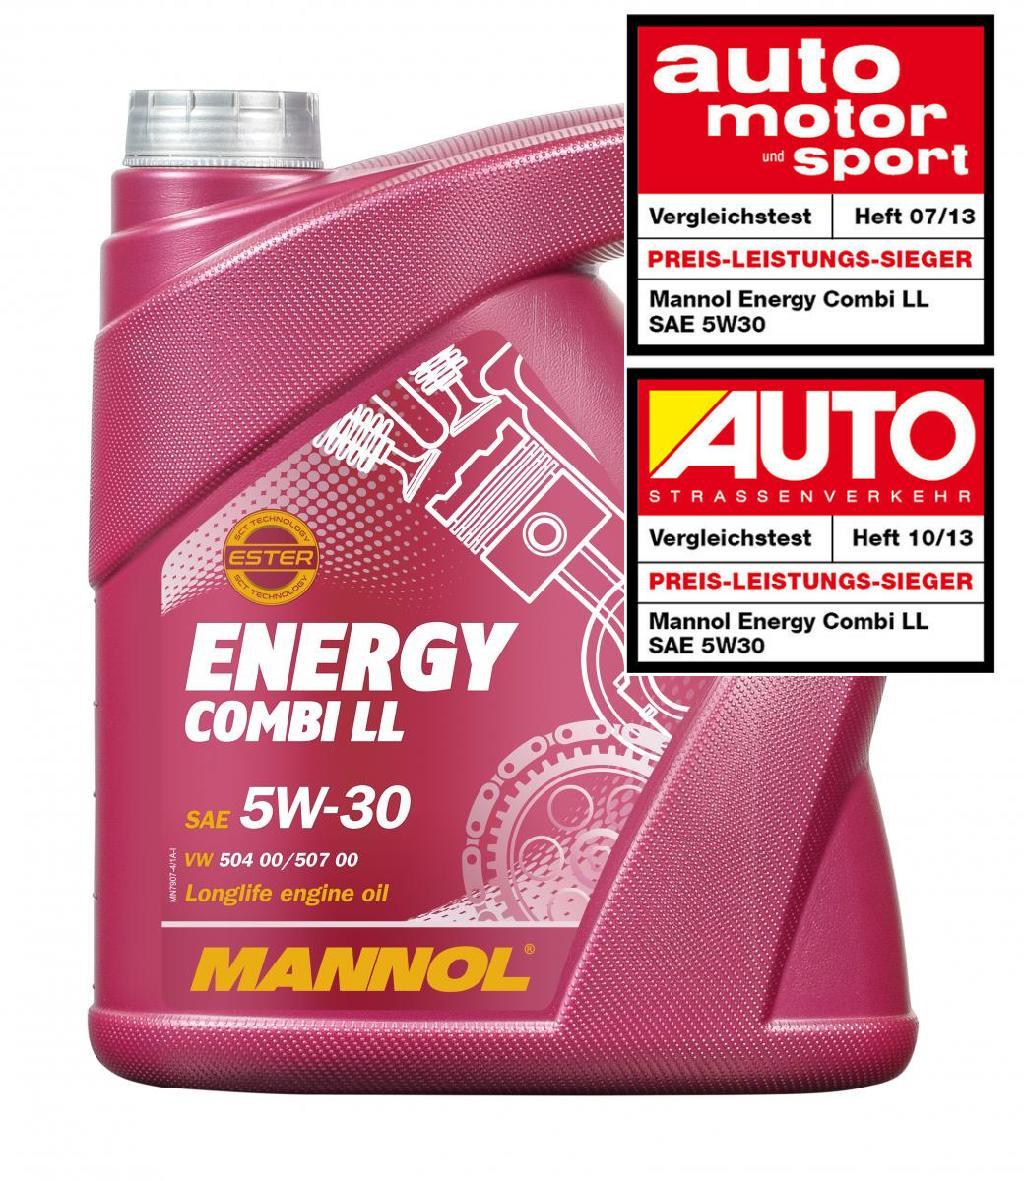 Motoröl MANNOL MN7907-5 Energy Combi LL 5W-30 5-Liter Longlife Benzin Diesel Bild 1